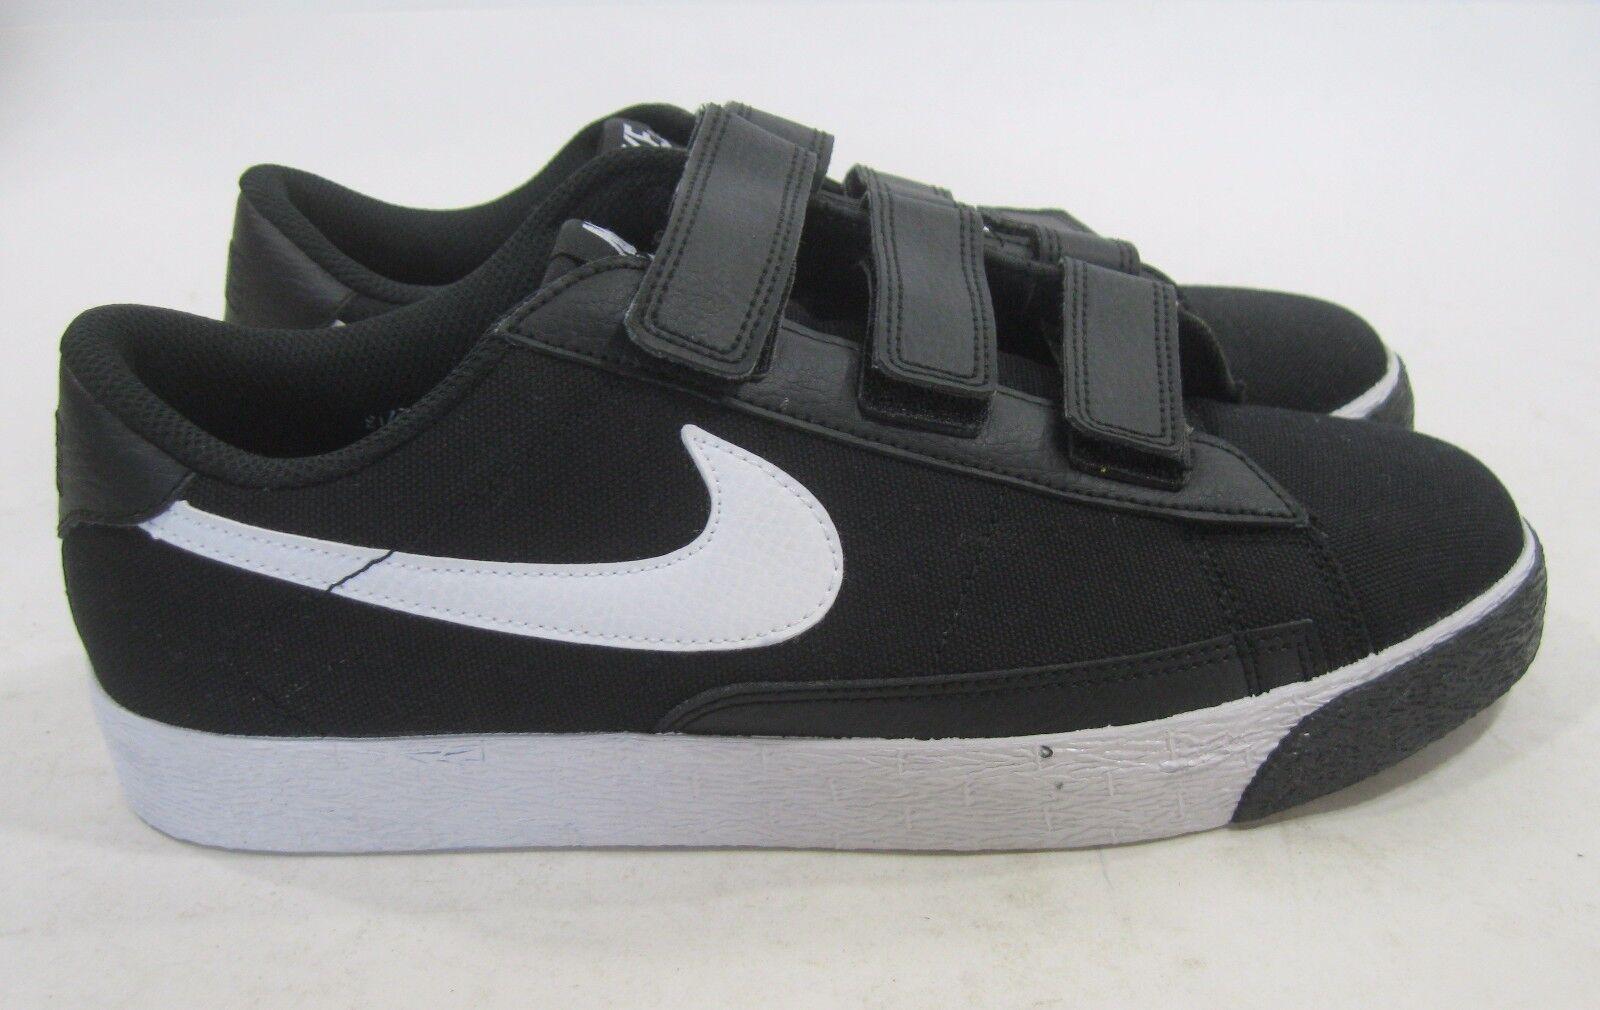 New Men Nike Blazer Low V Mens Athletic shoes 347637-003 Size 8.5